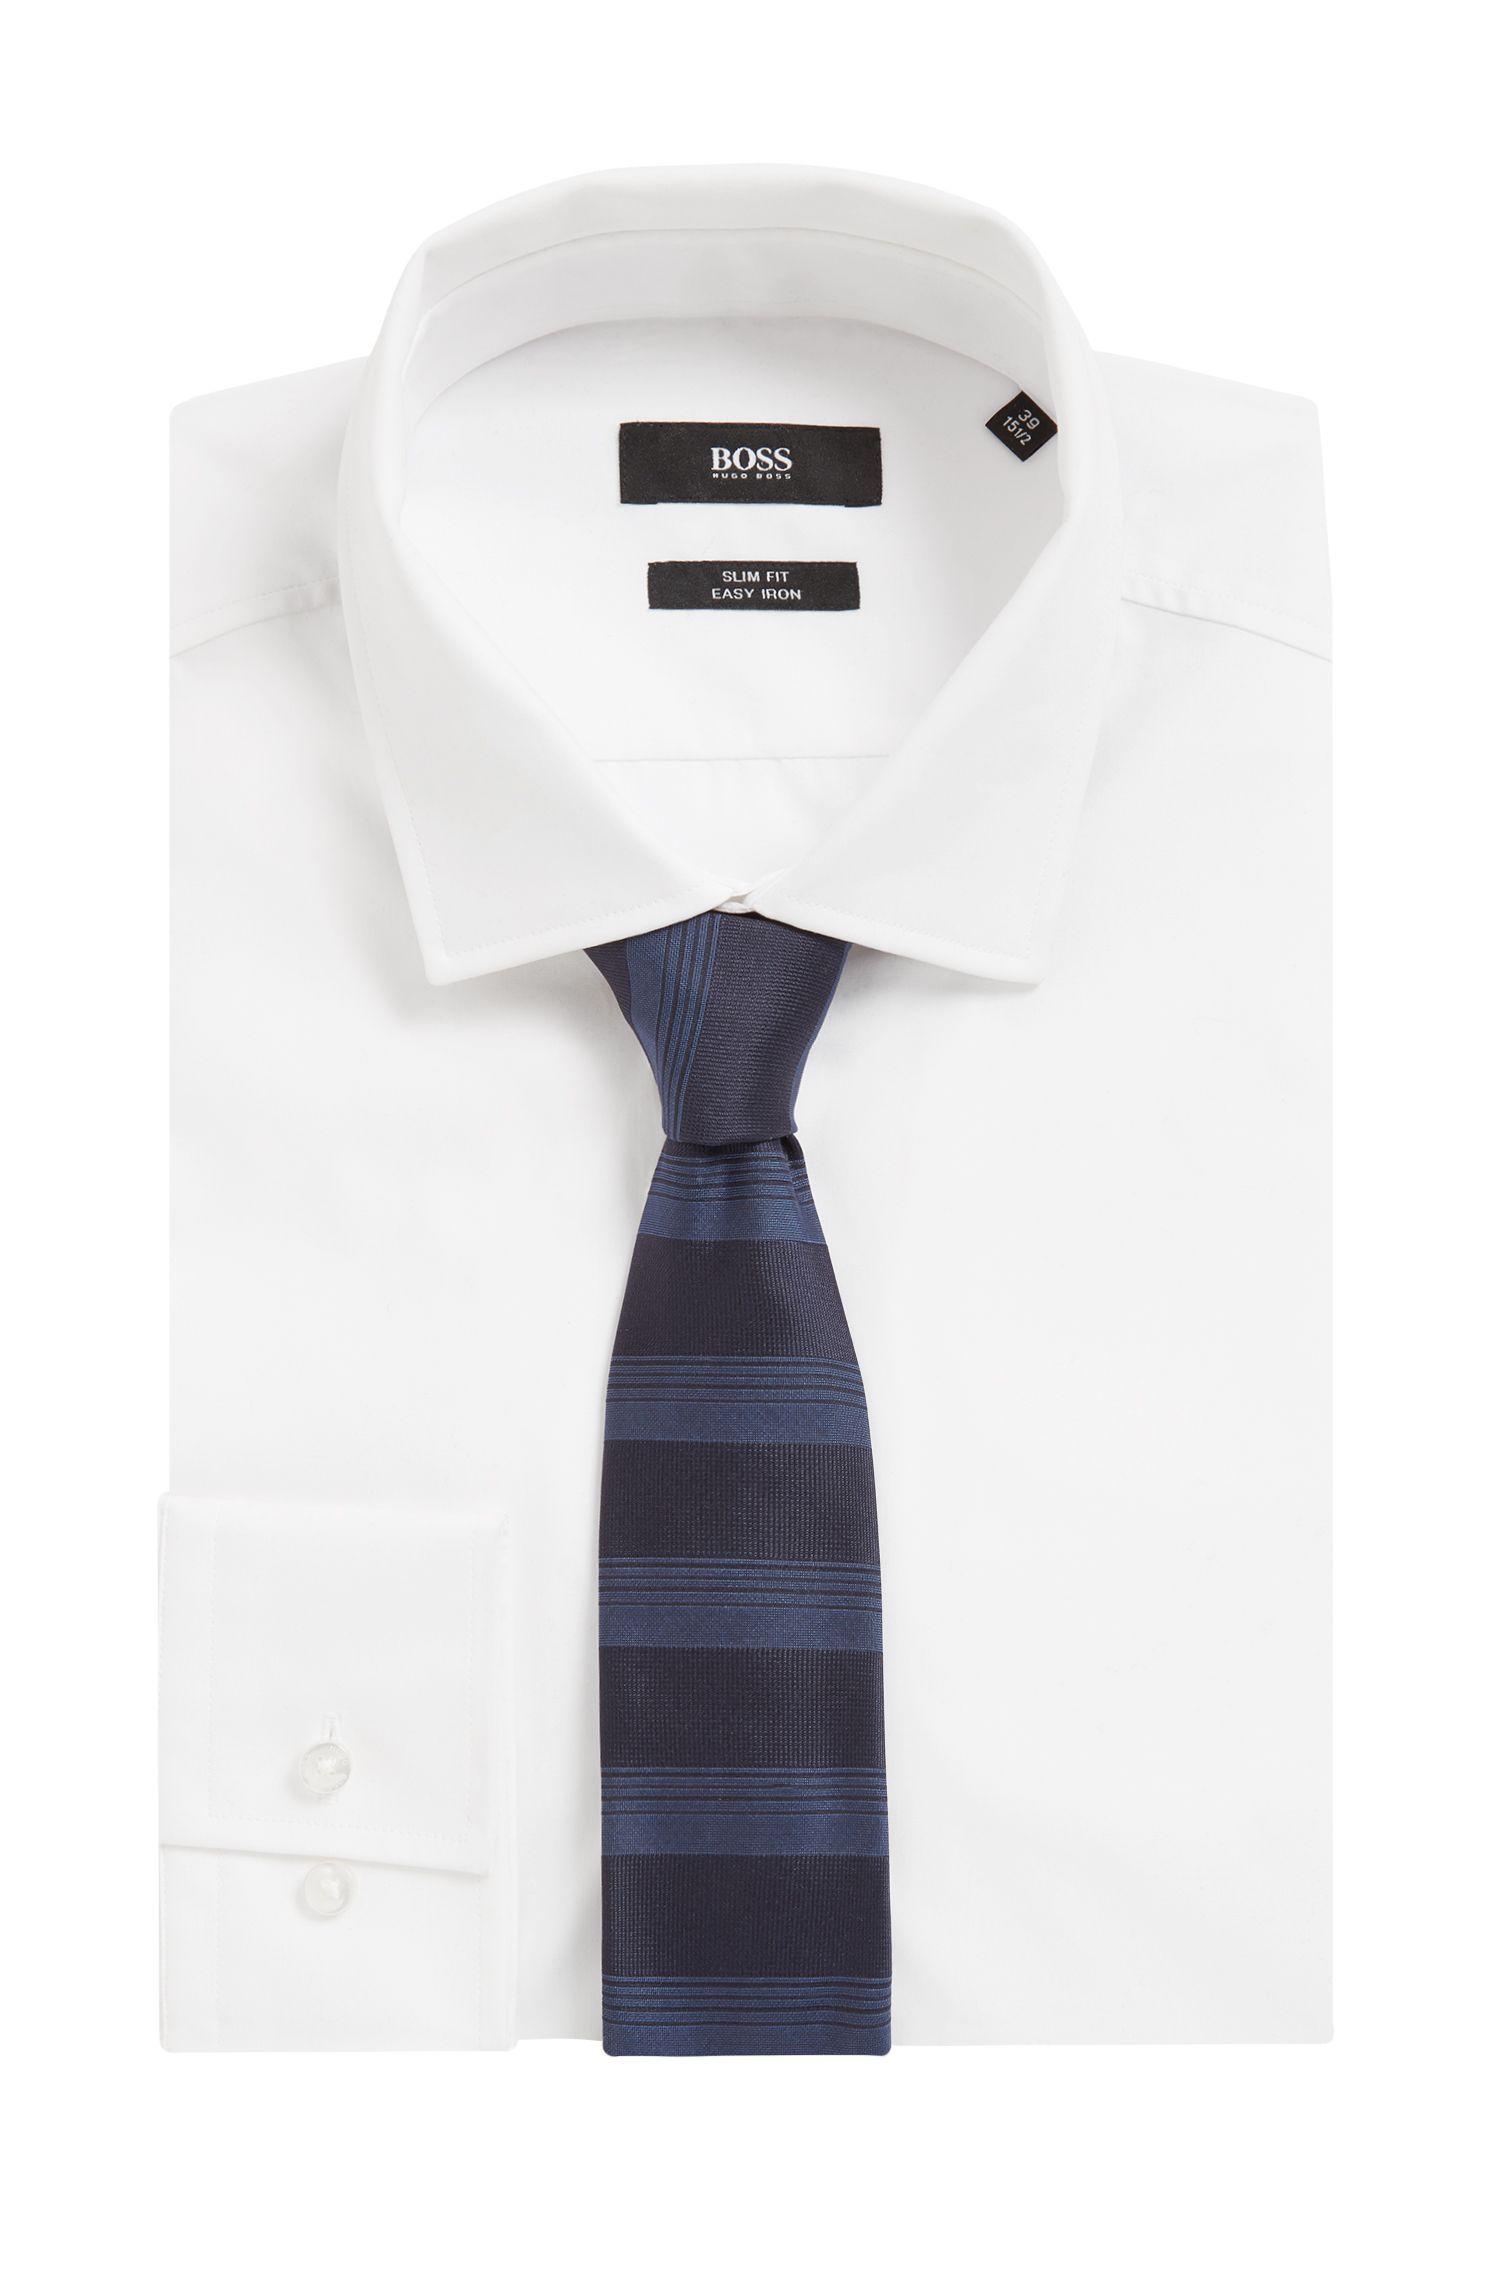 Corbata elaborada a mano en jacquard de seda con rayas horizontales